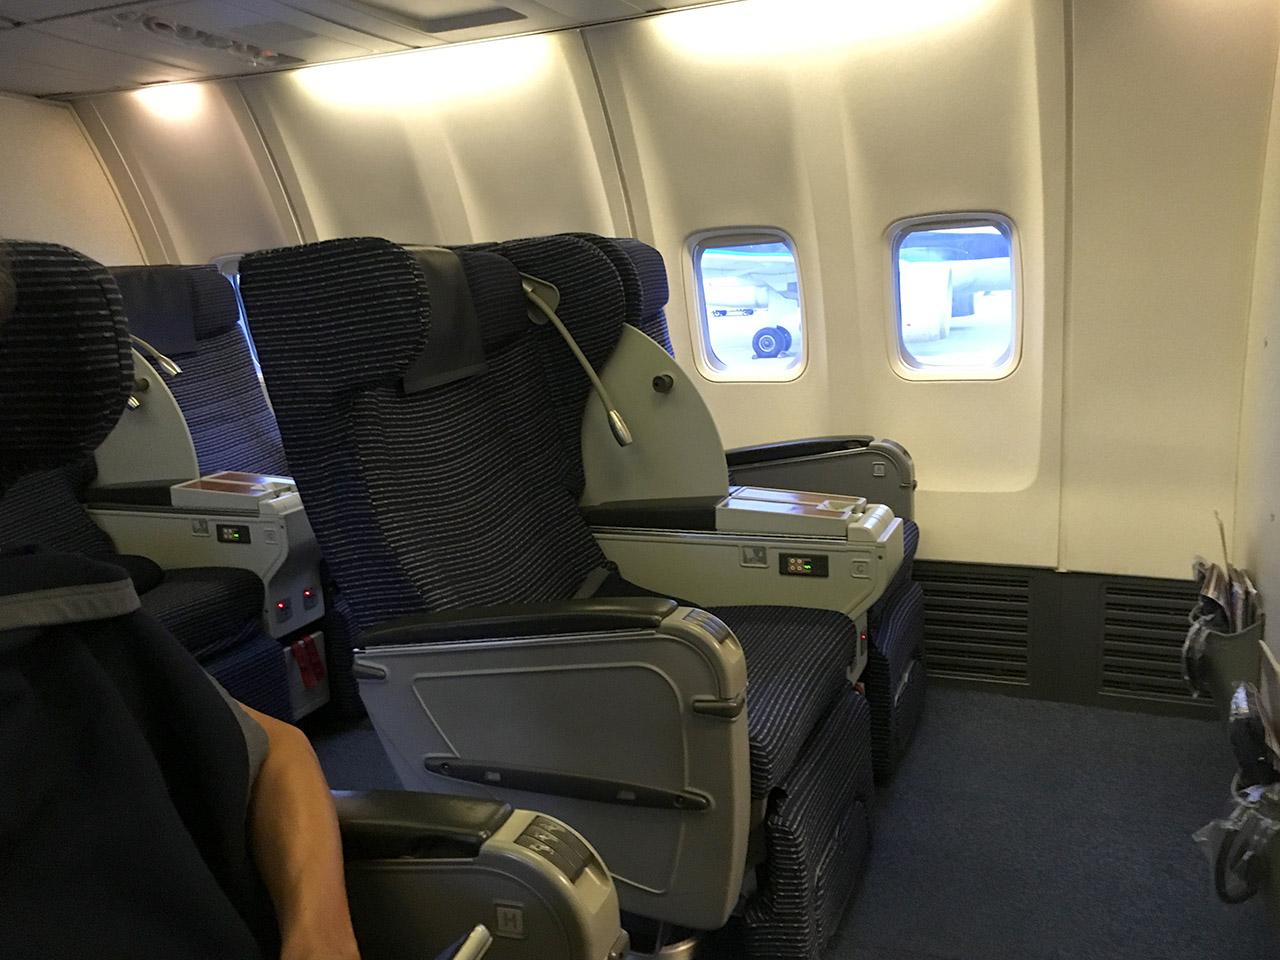 ANA,737,プレミアムクラス